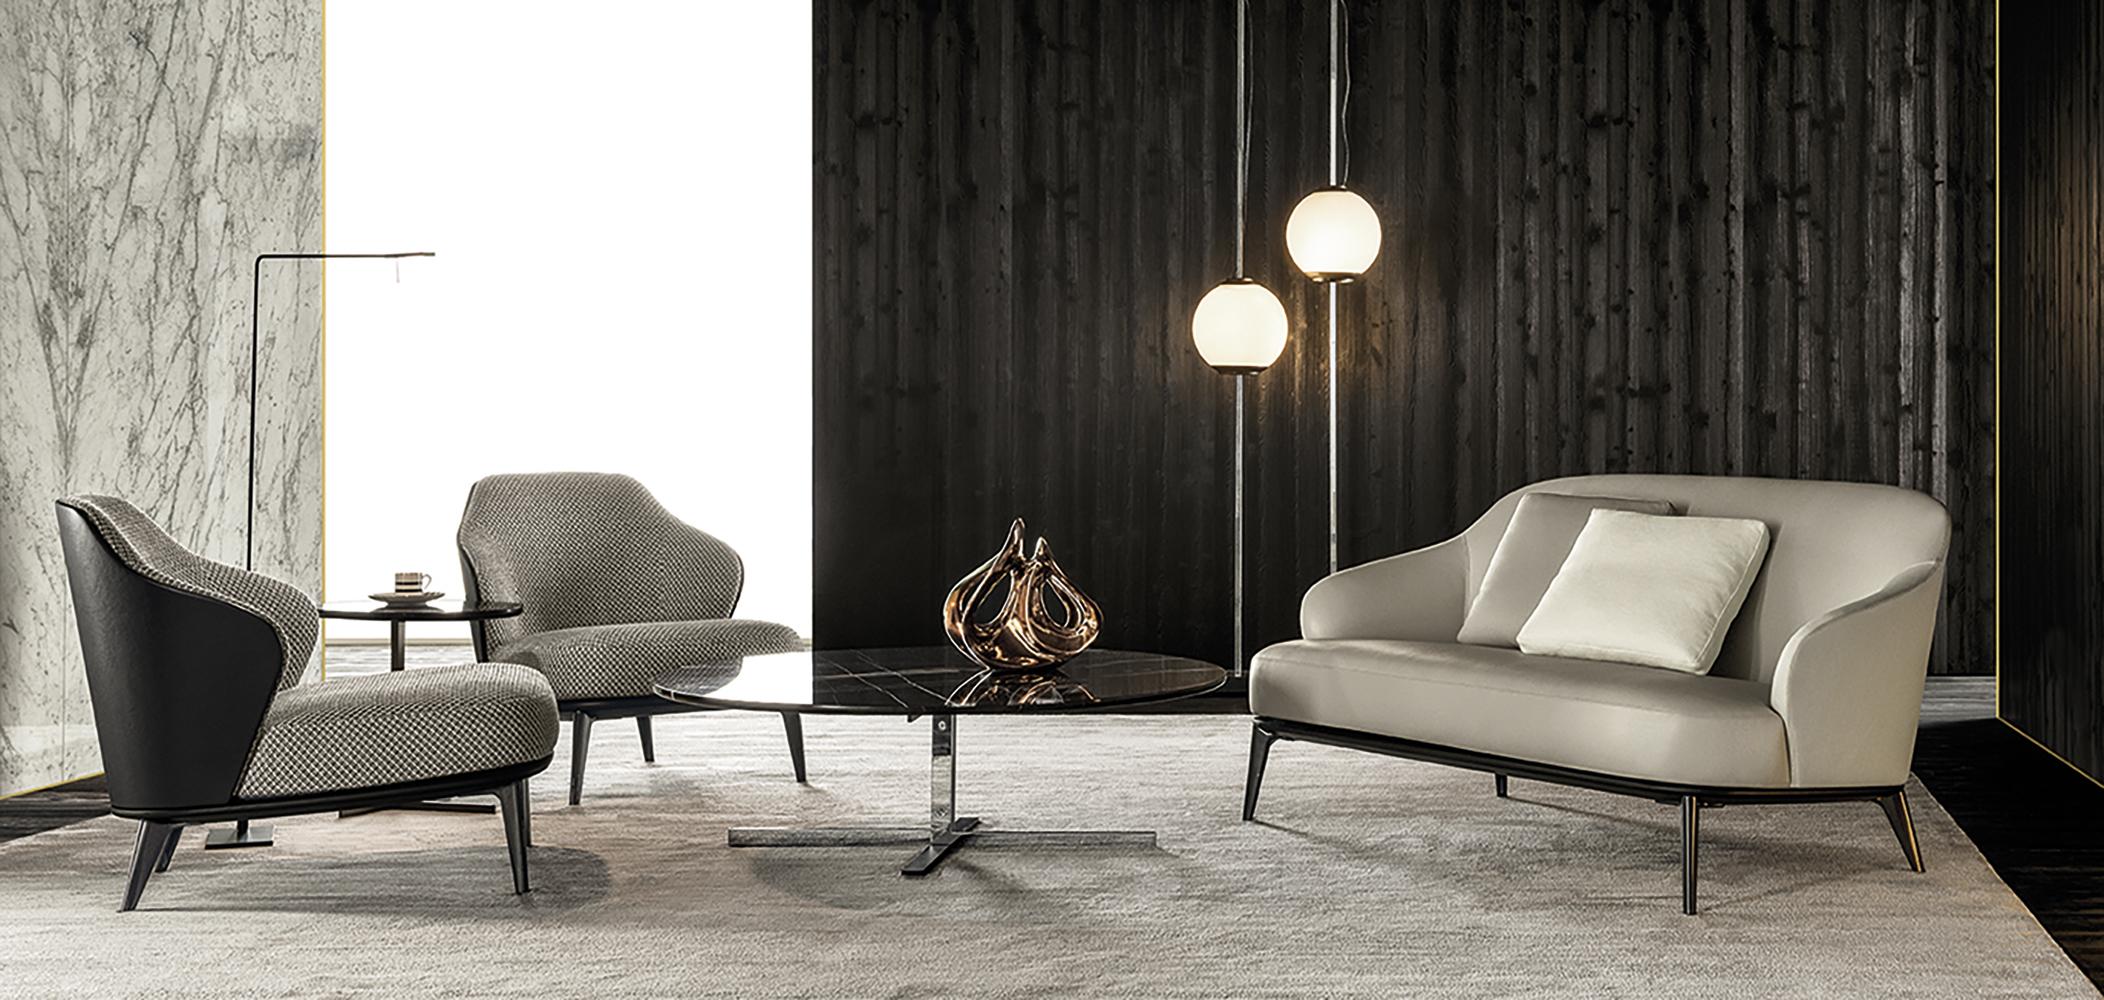 Leslie Armchair Designed By Rodolfo Dordoni Minotti